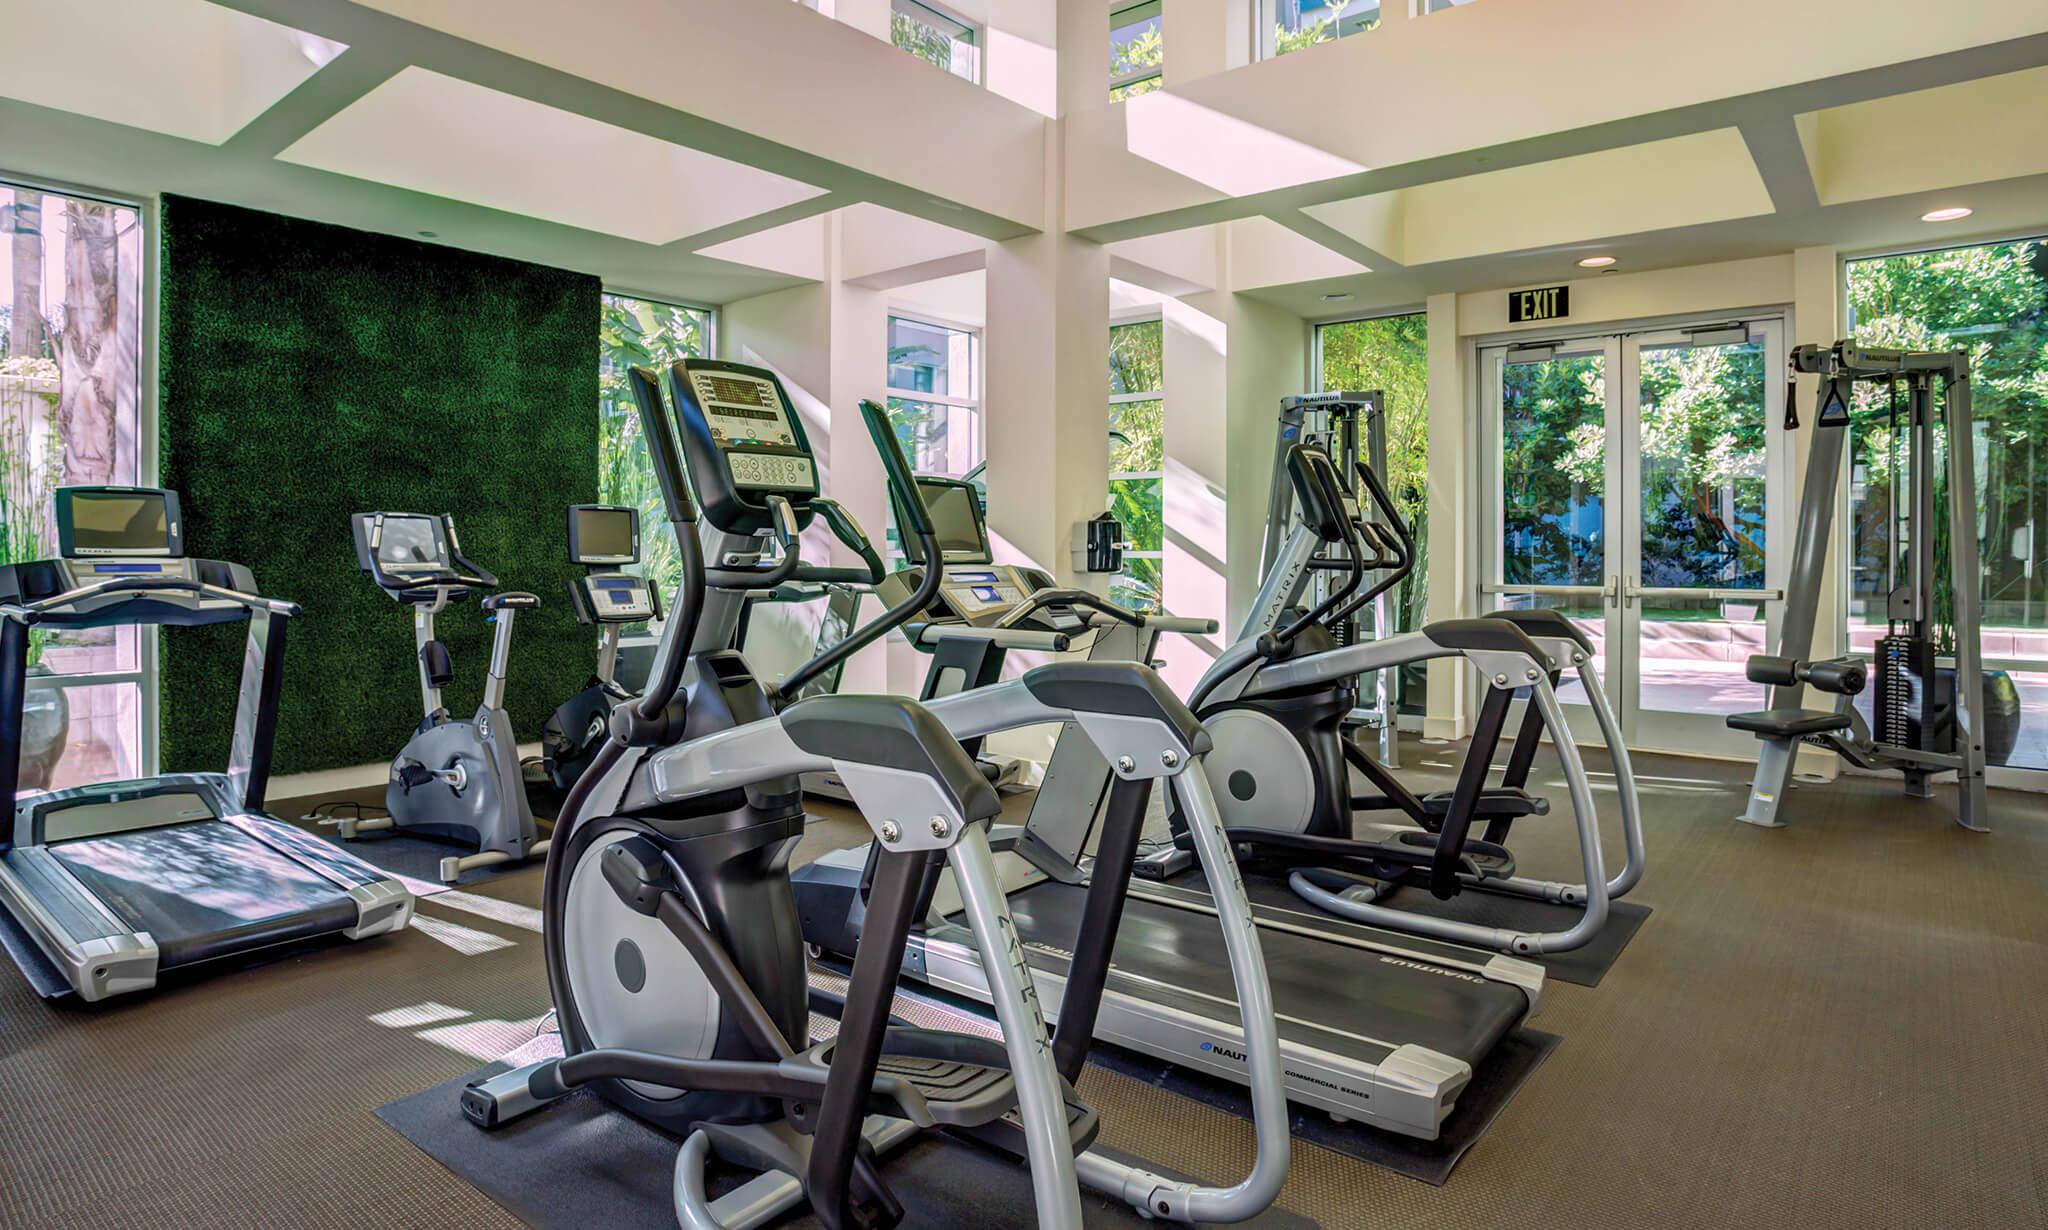 550 Moreland Apartments apartments in Santa Clara CA to rent photo 6